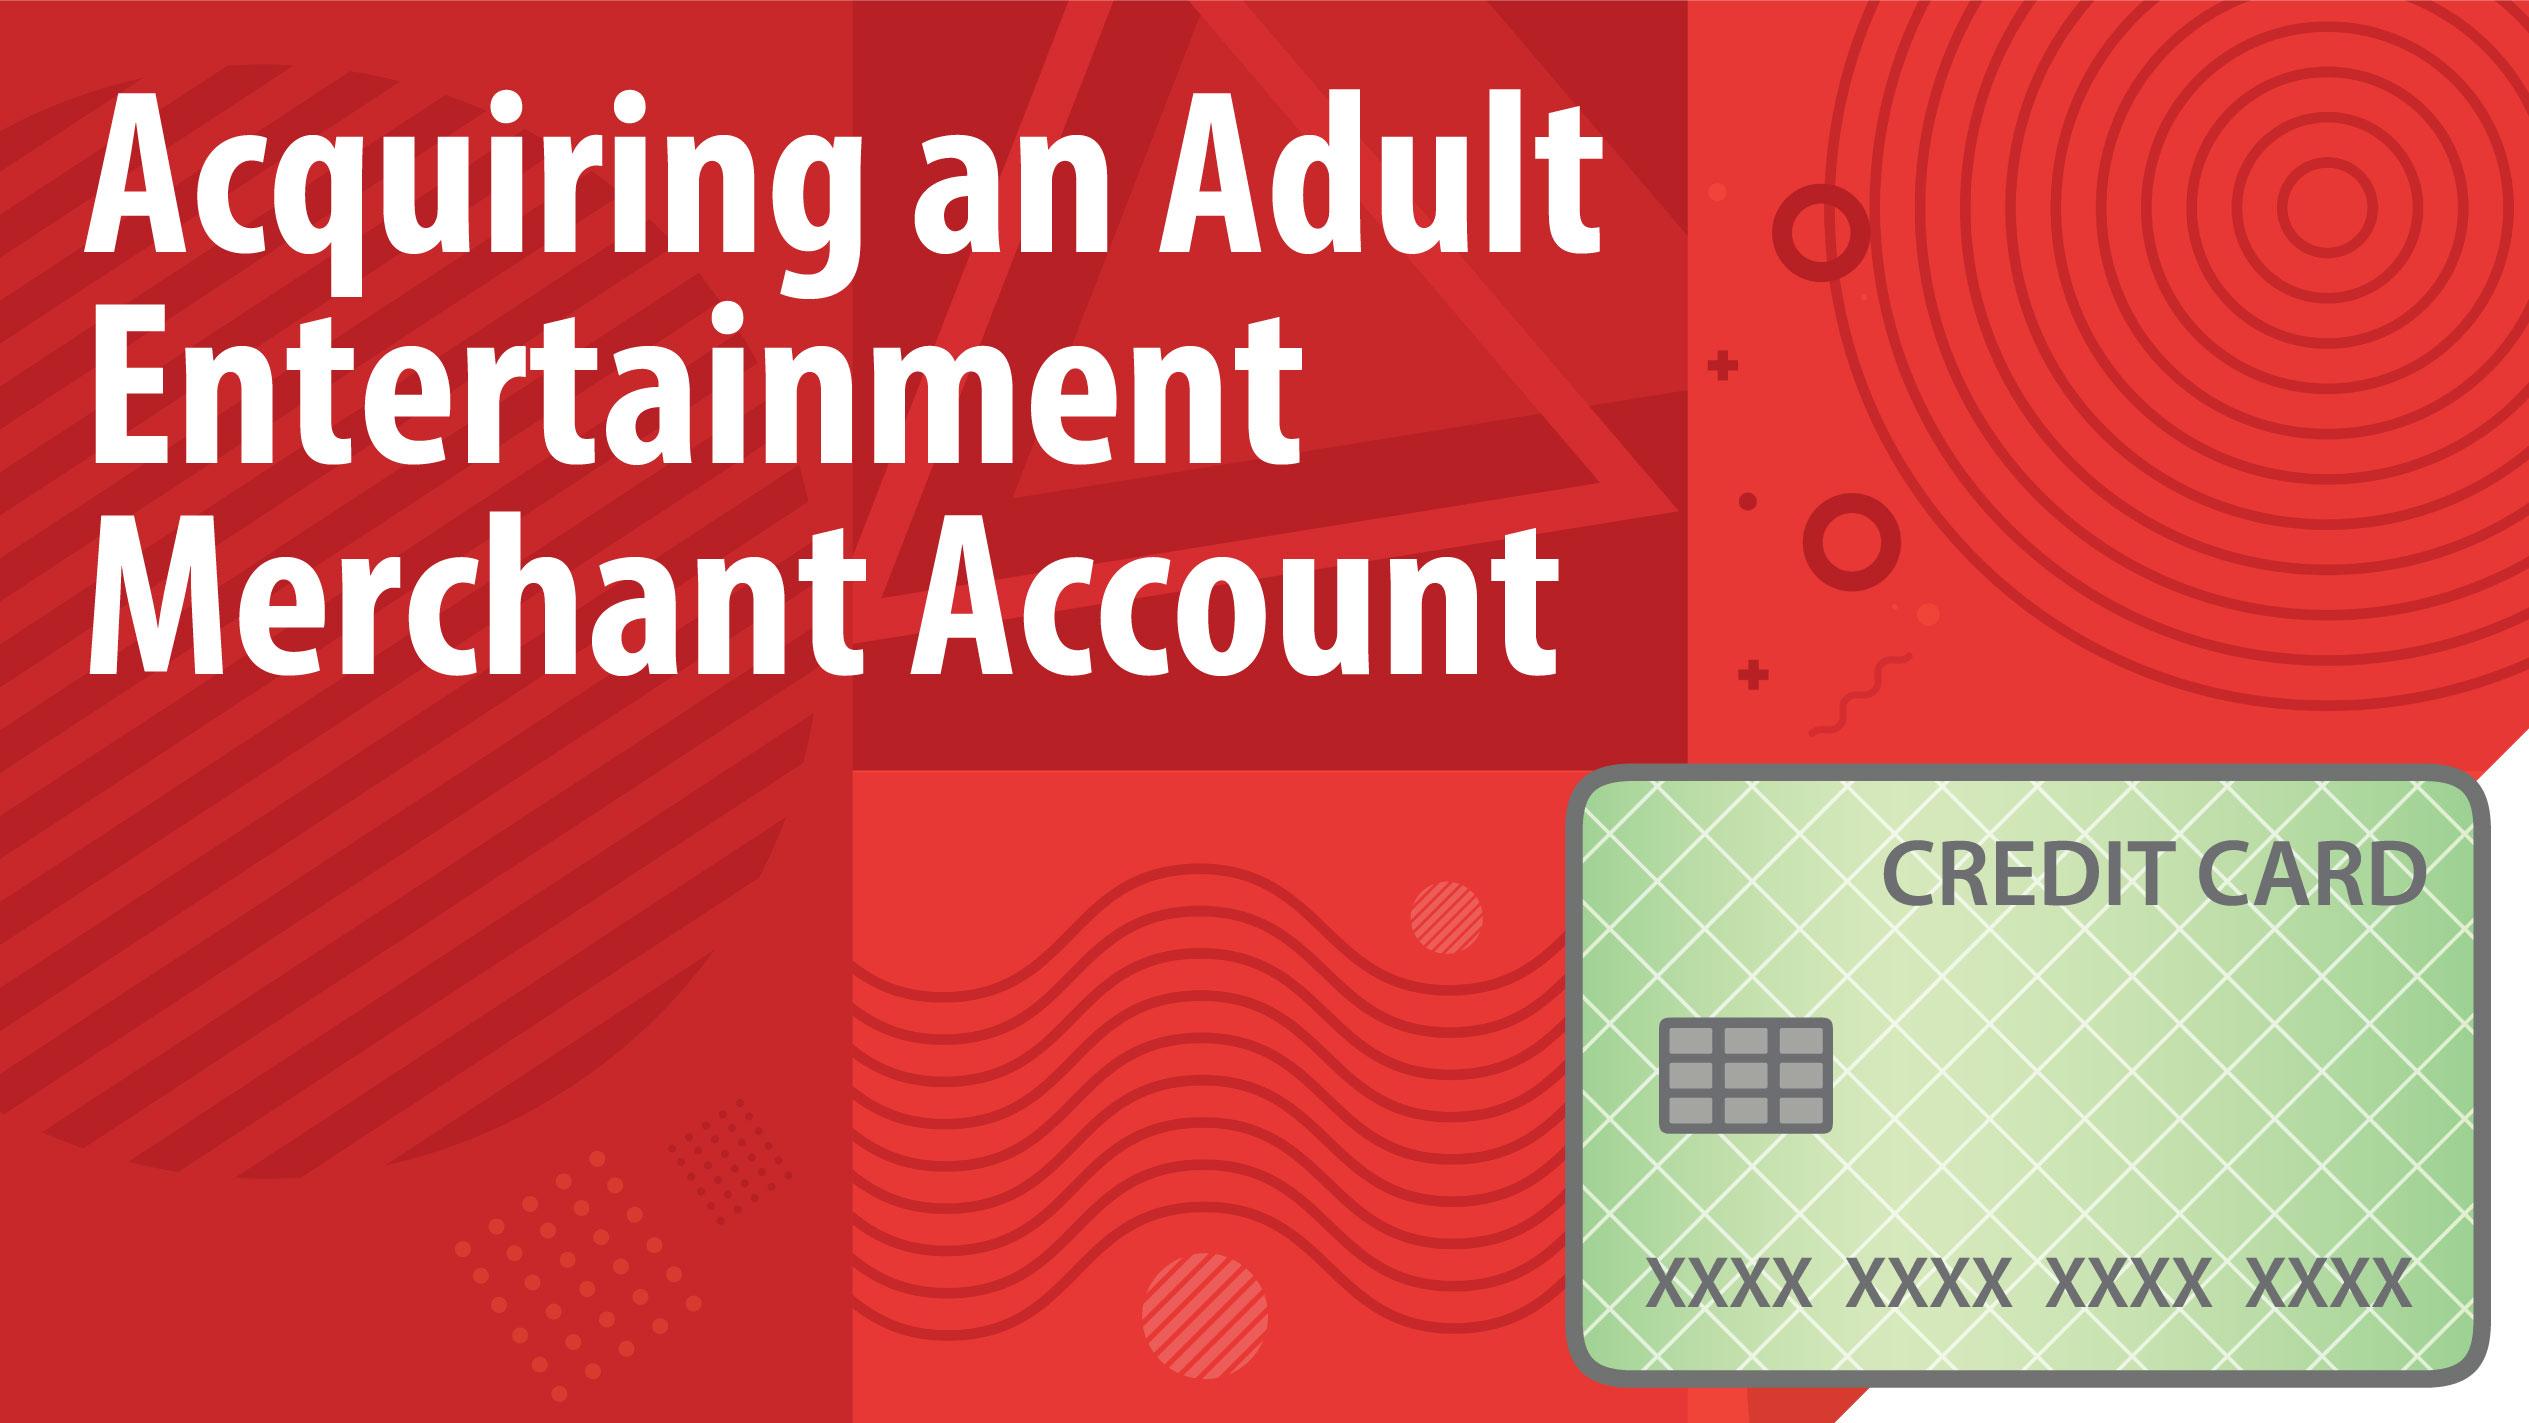 Acquiring an Adult Entertainment Merchant Account